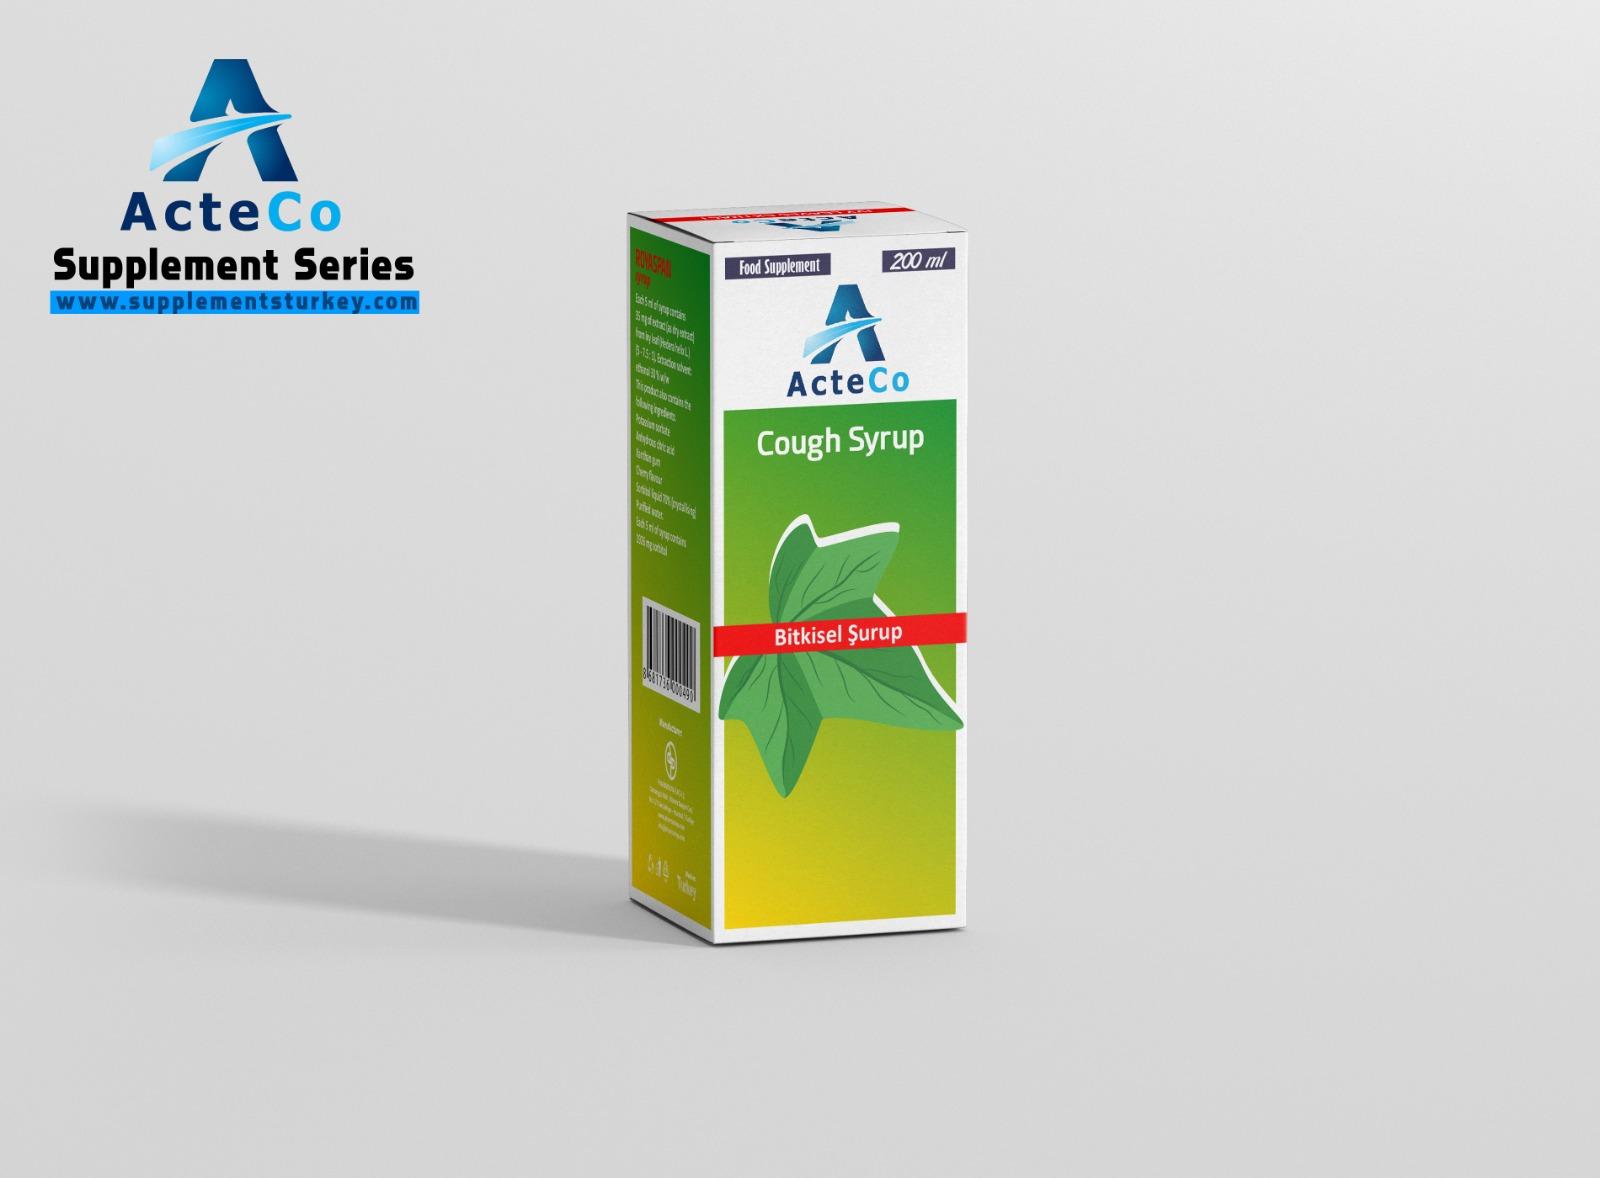 ActeCo Pharma Cough Syrup